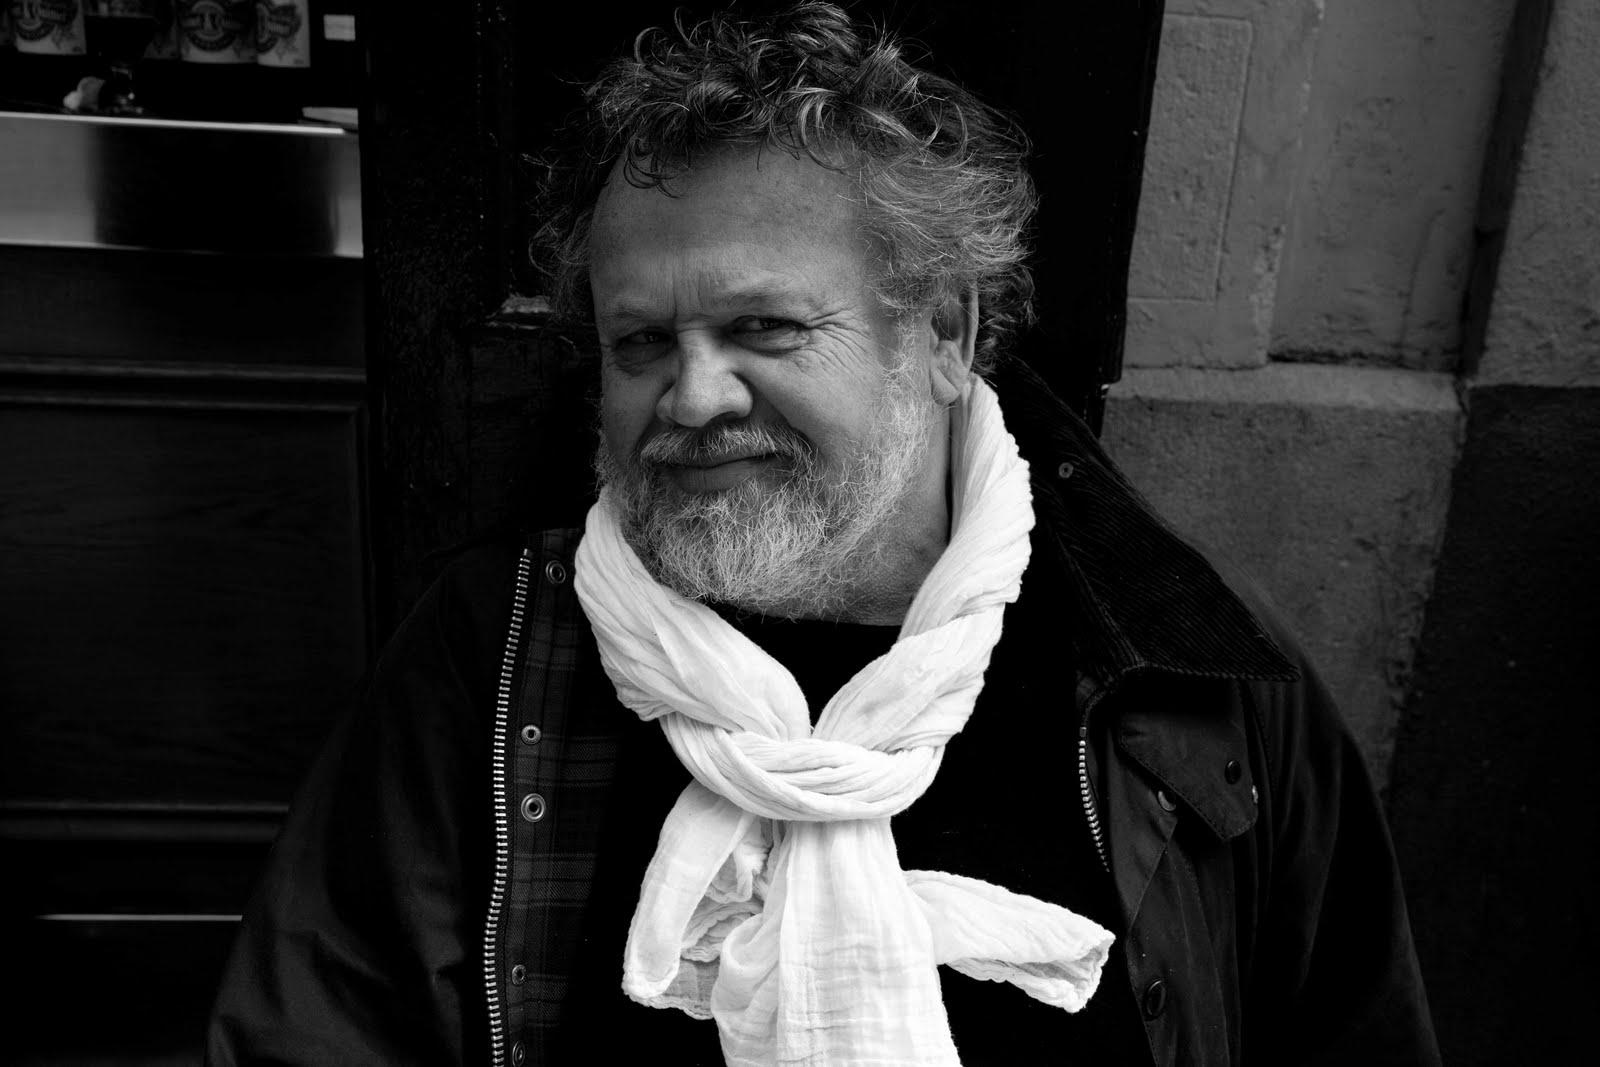 Portrait Photographer Antonin Kratochvil